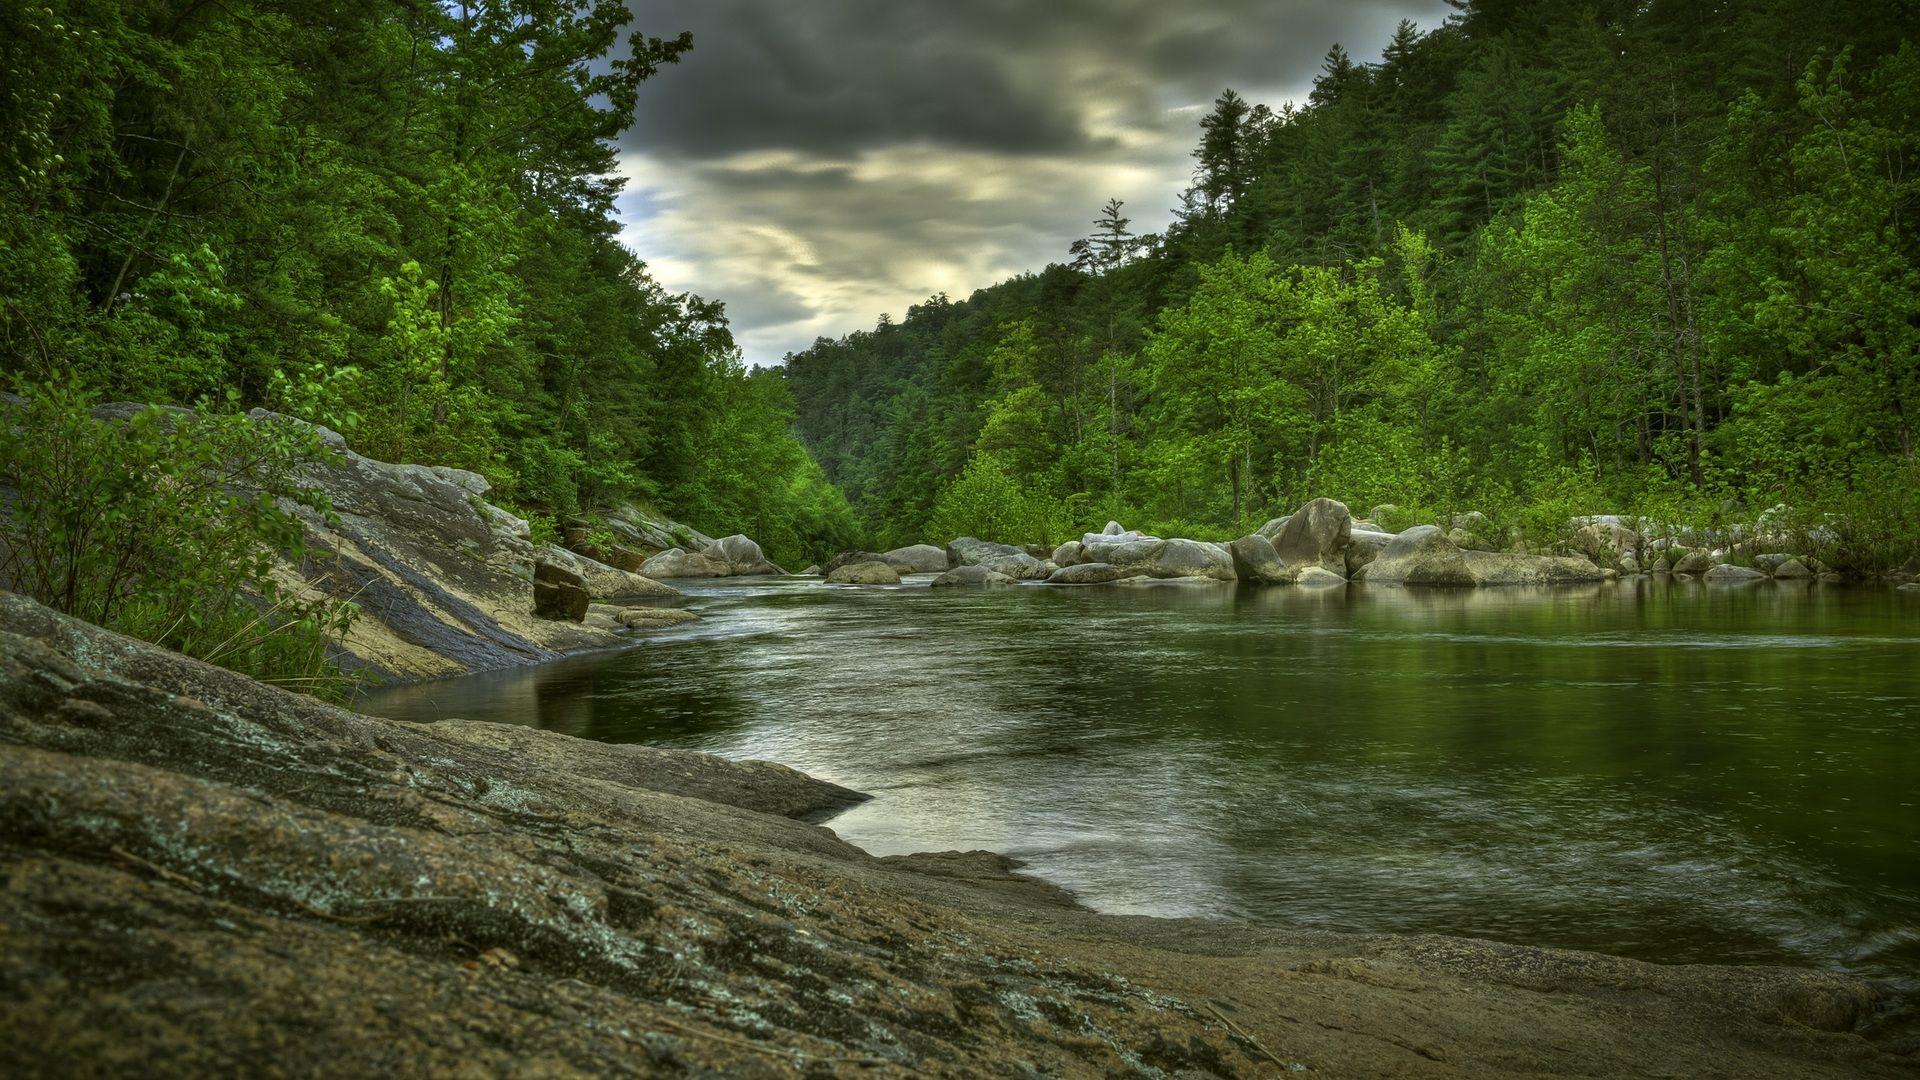 wilsons creek springfield missouri usa nature wallpaper